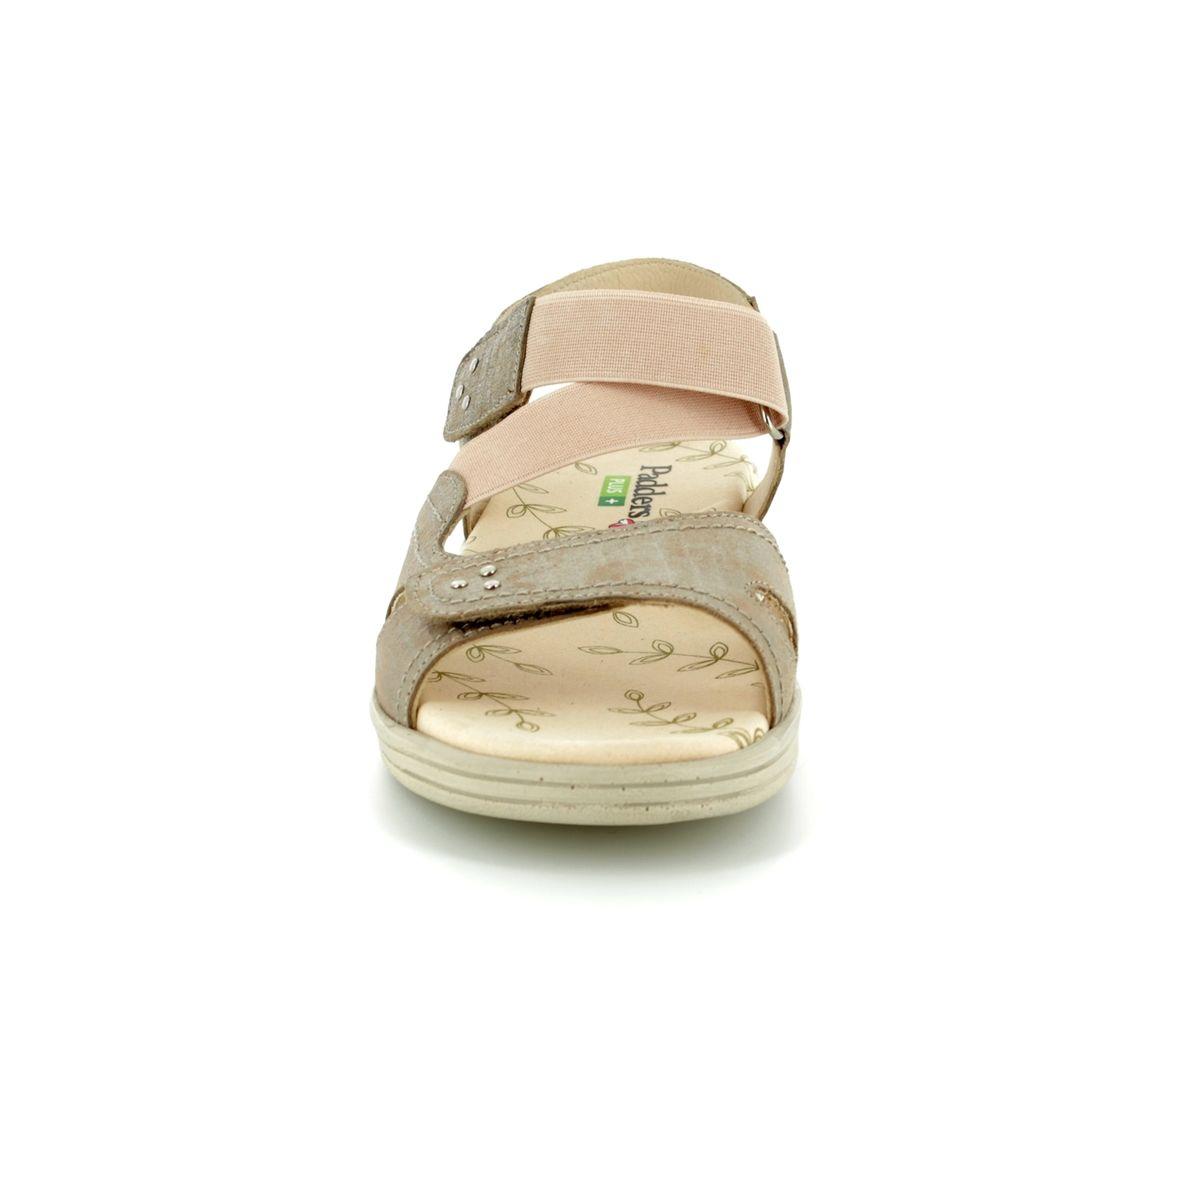 4d5e82e83 Padders Sandals - Metallic - 0769 64 CRUISE 3E-4E